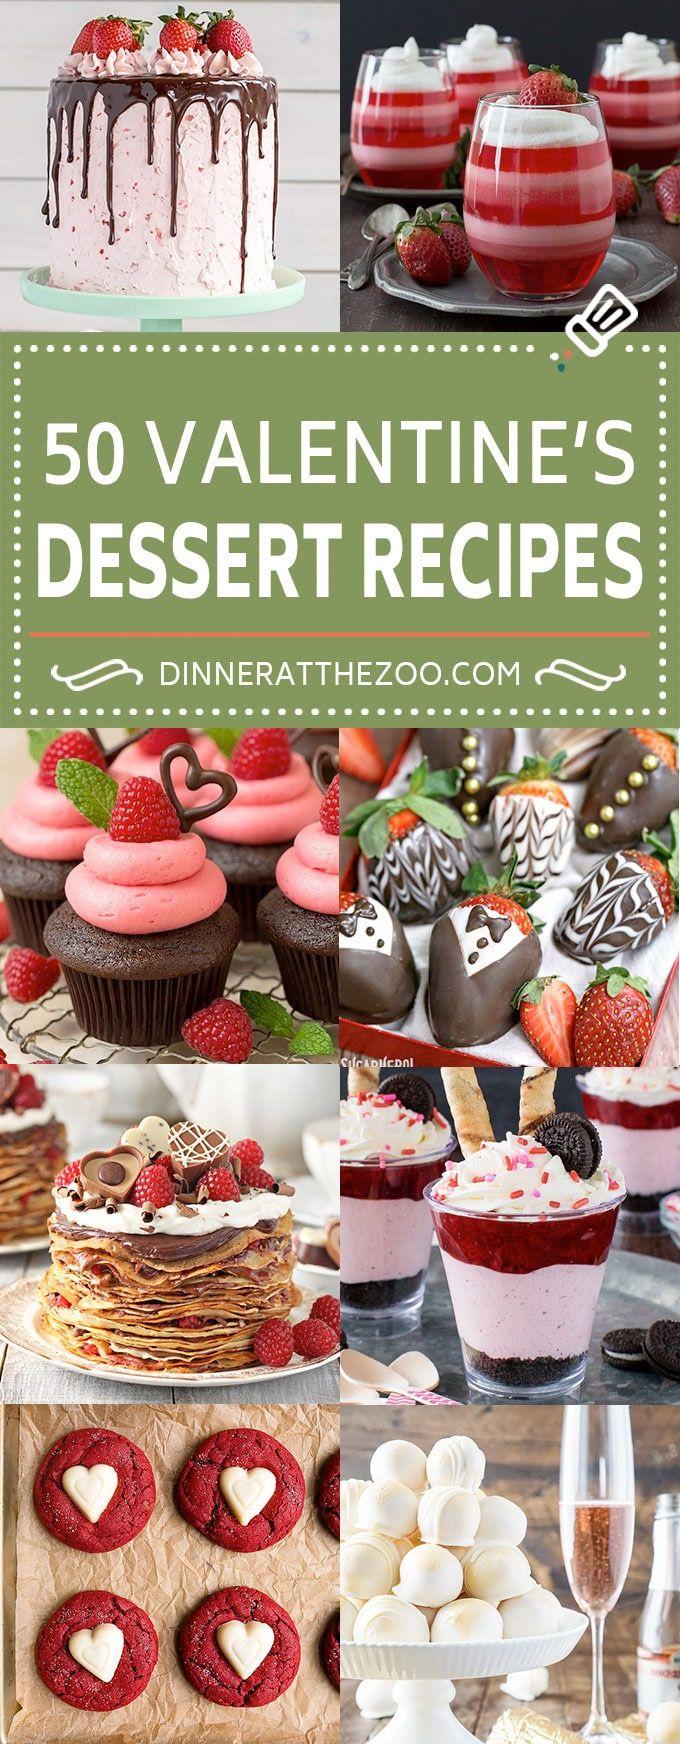 50 Valentine's Day Dessert Recipes